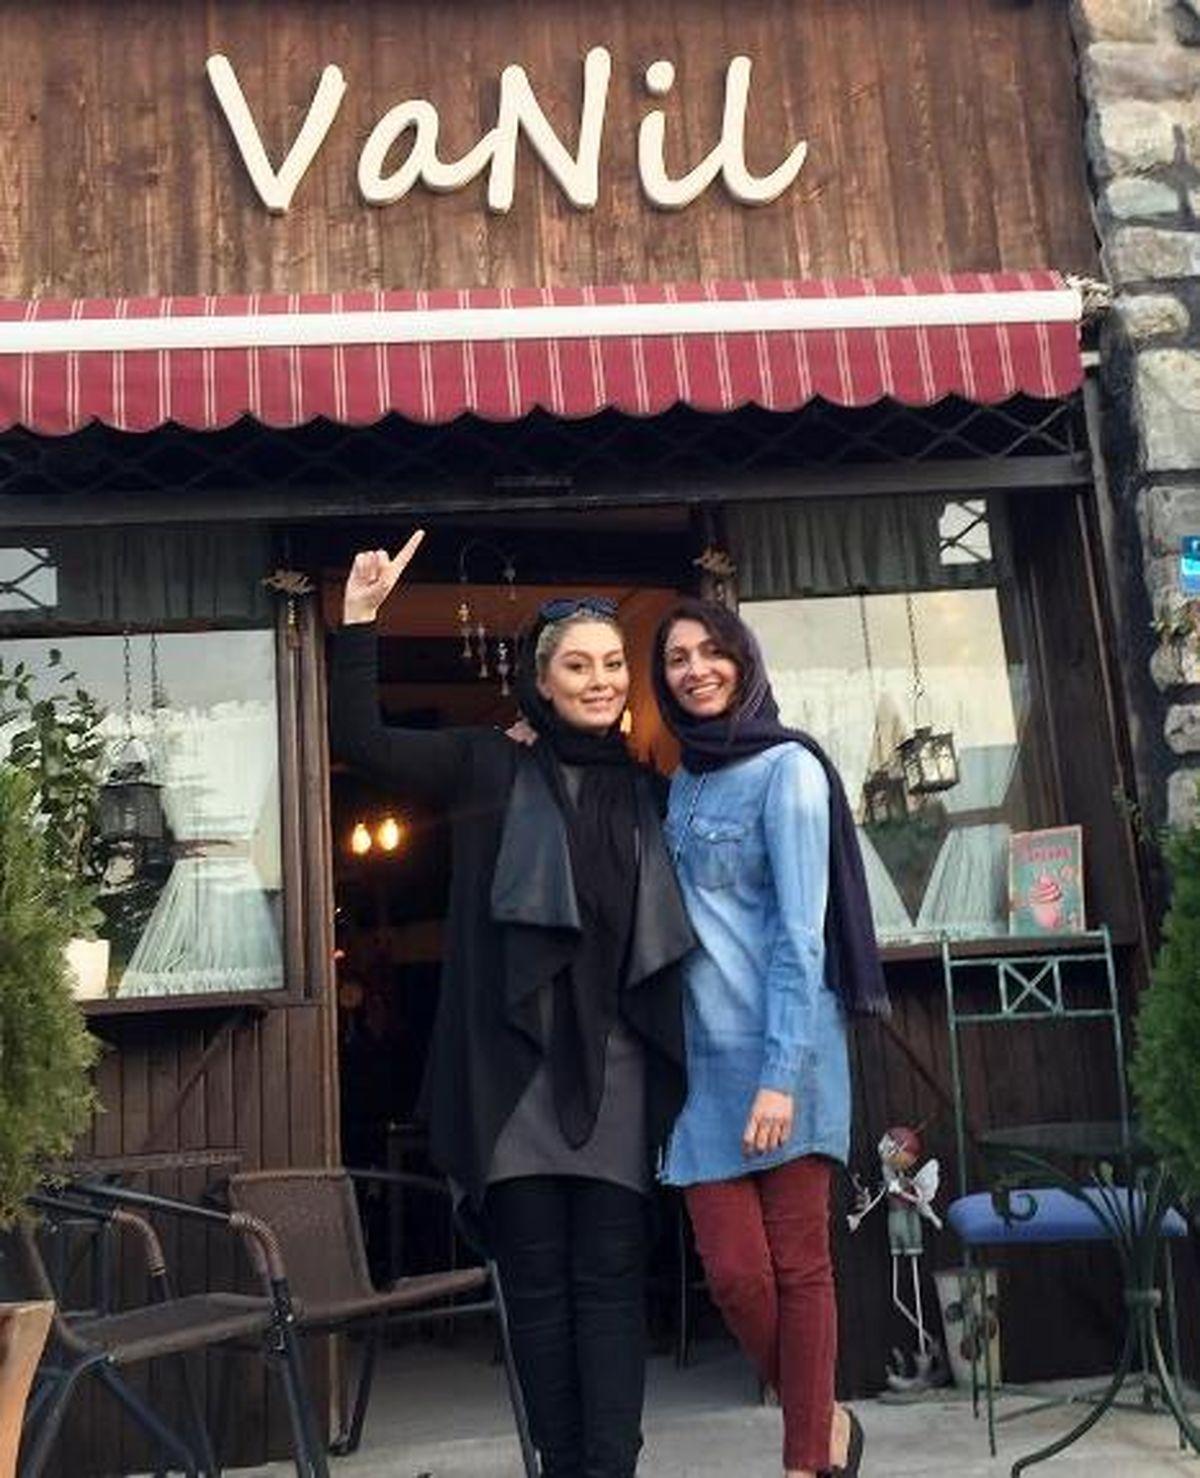 کافه شیک و لاکچری همسر امین حیایی در لواسان + عکس